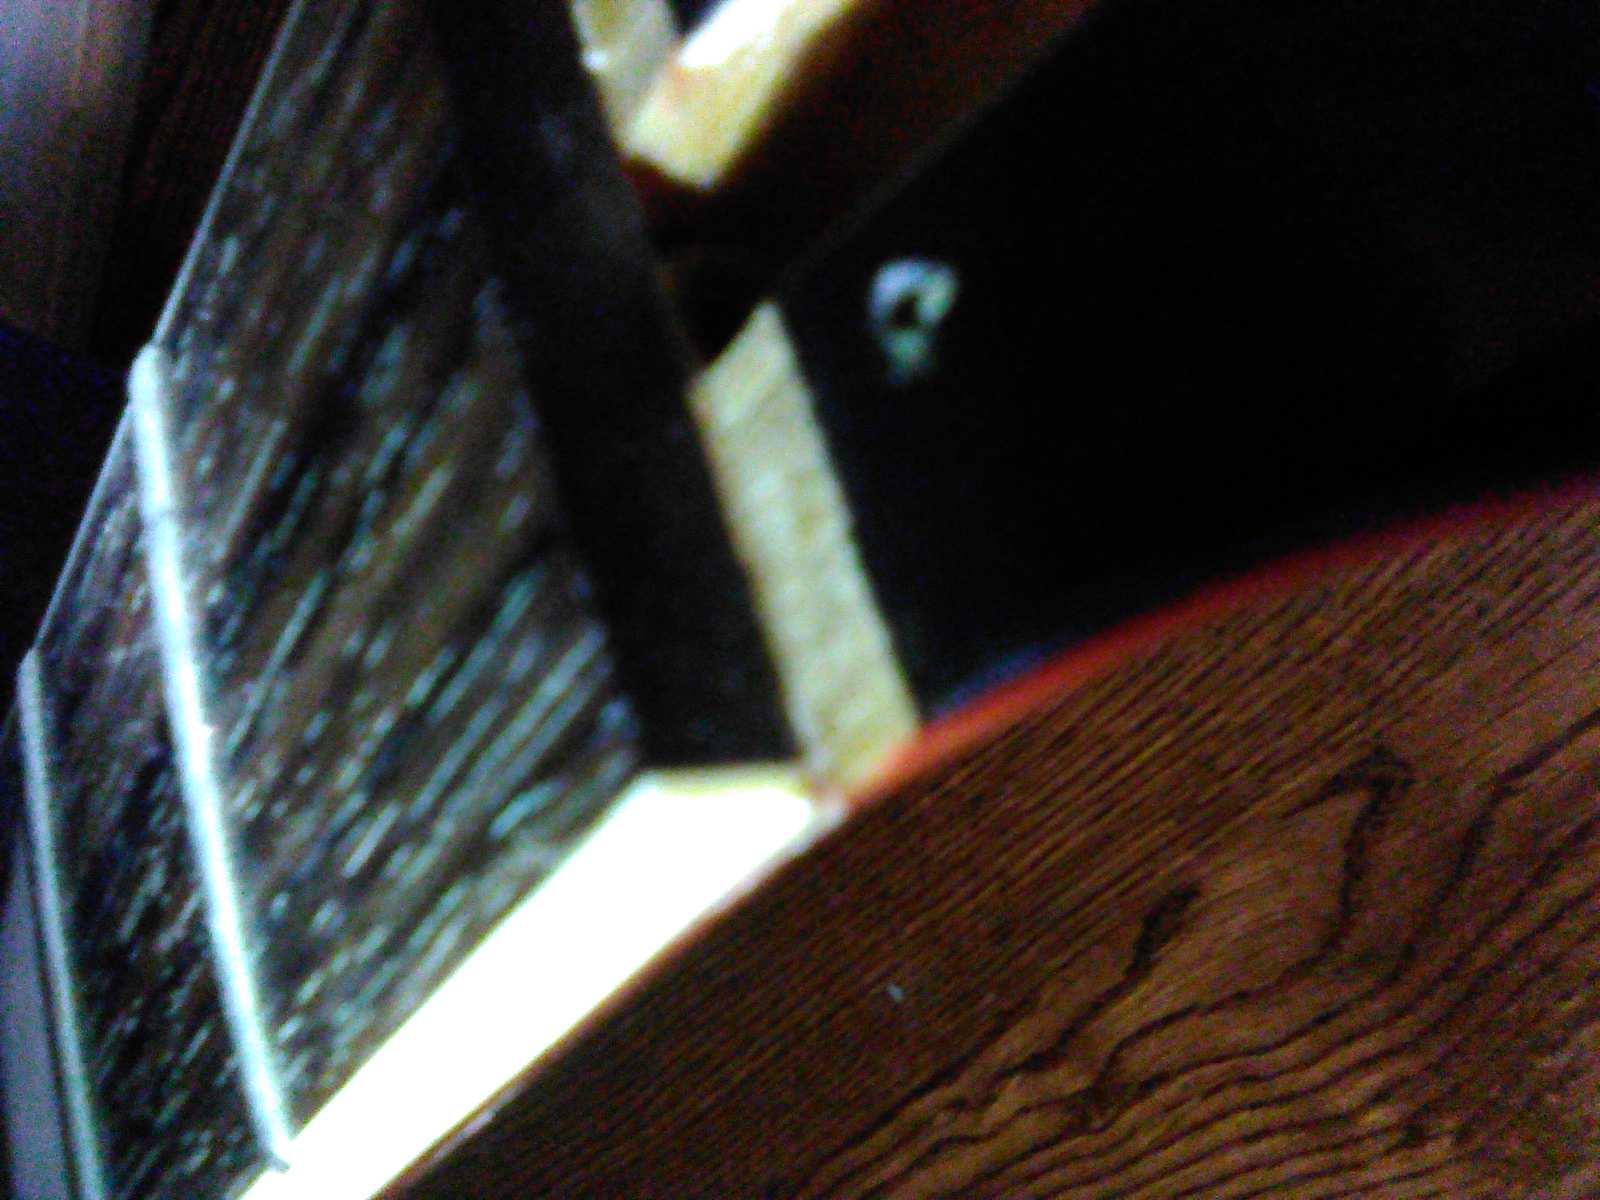 Respraying finish cracks in beater guitar-neck-6-jpg